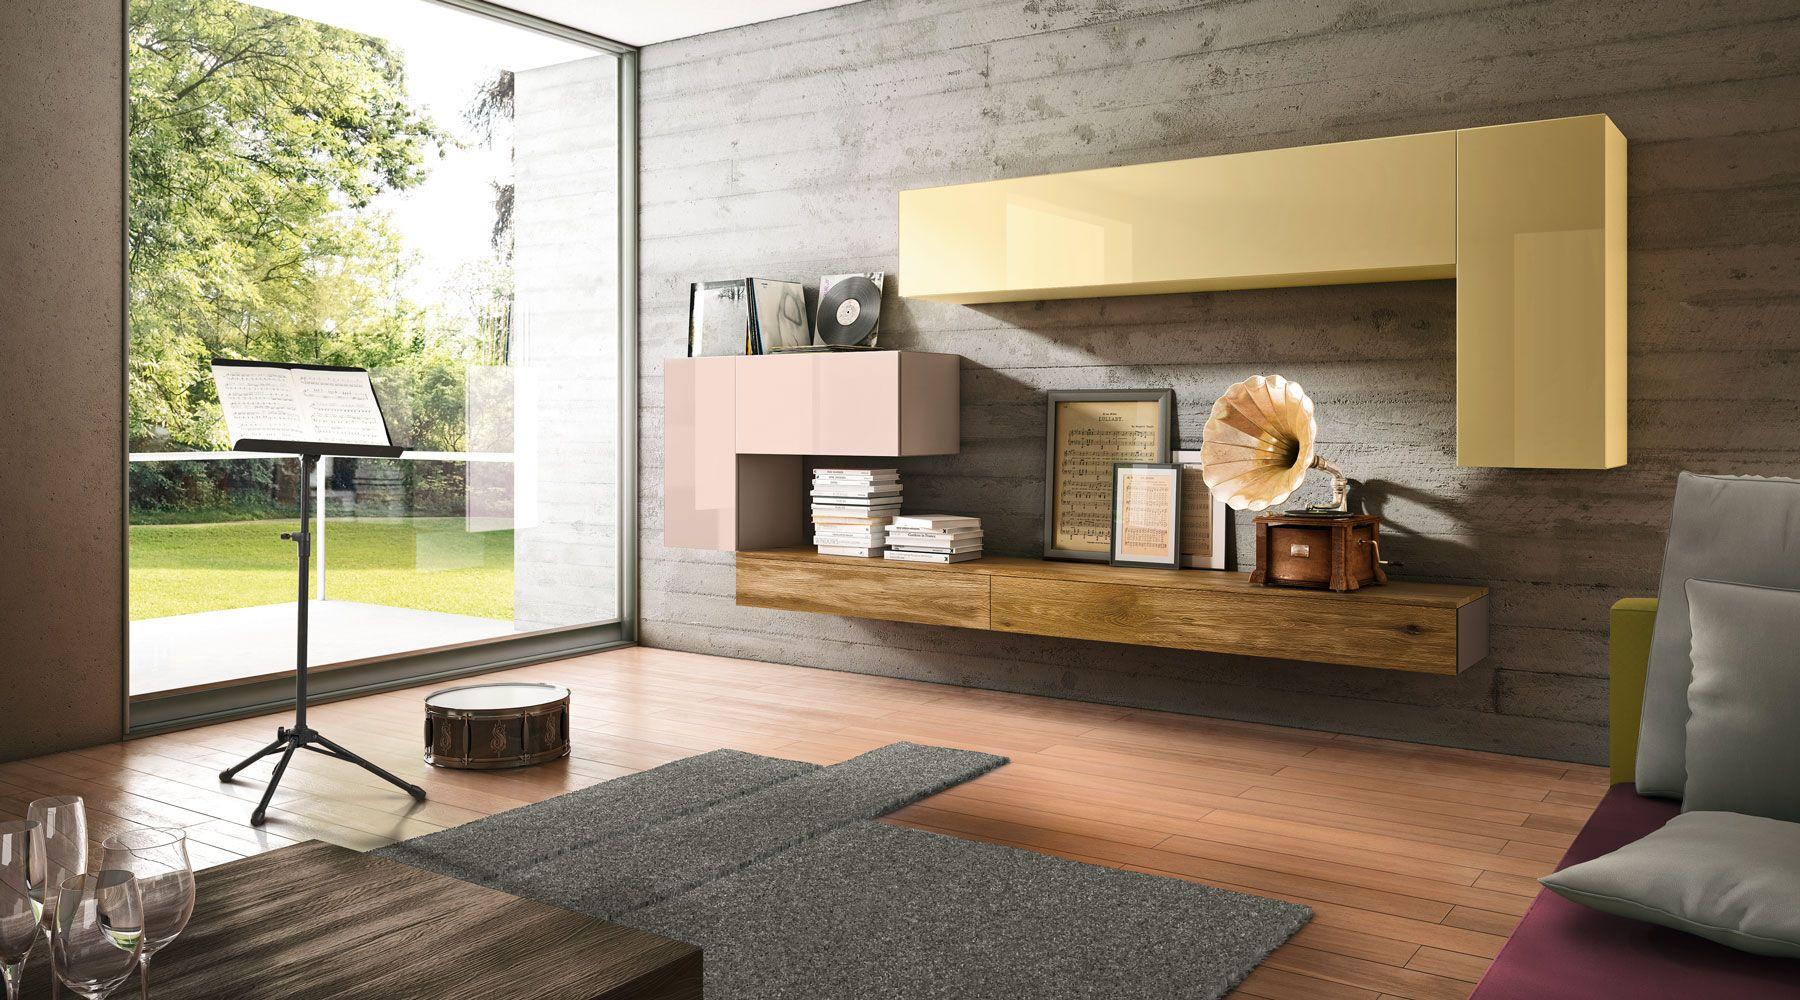 Sistema 36e8 living area painel de madeira painel e for Progettare un salone